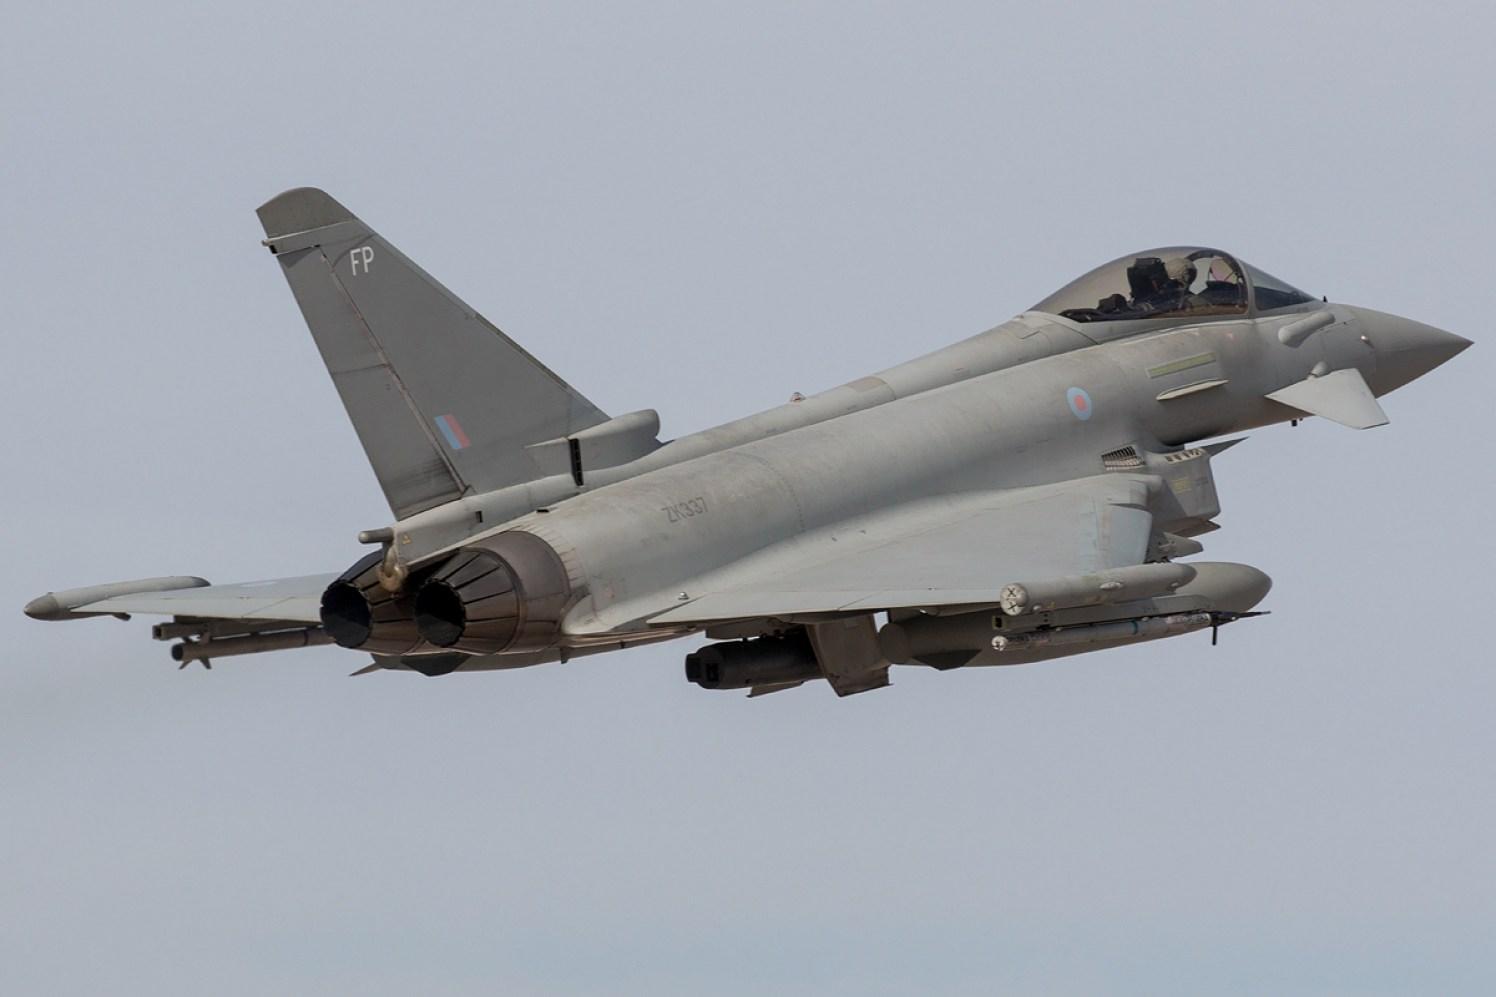 © Kevin Bell - RAF Typhoon FGR4 ZK337 - Red Flag 17-1